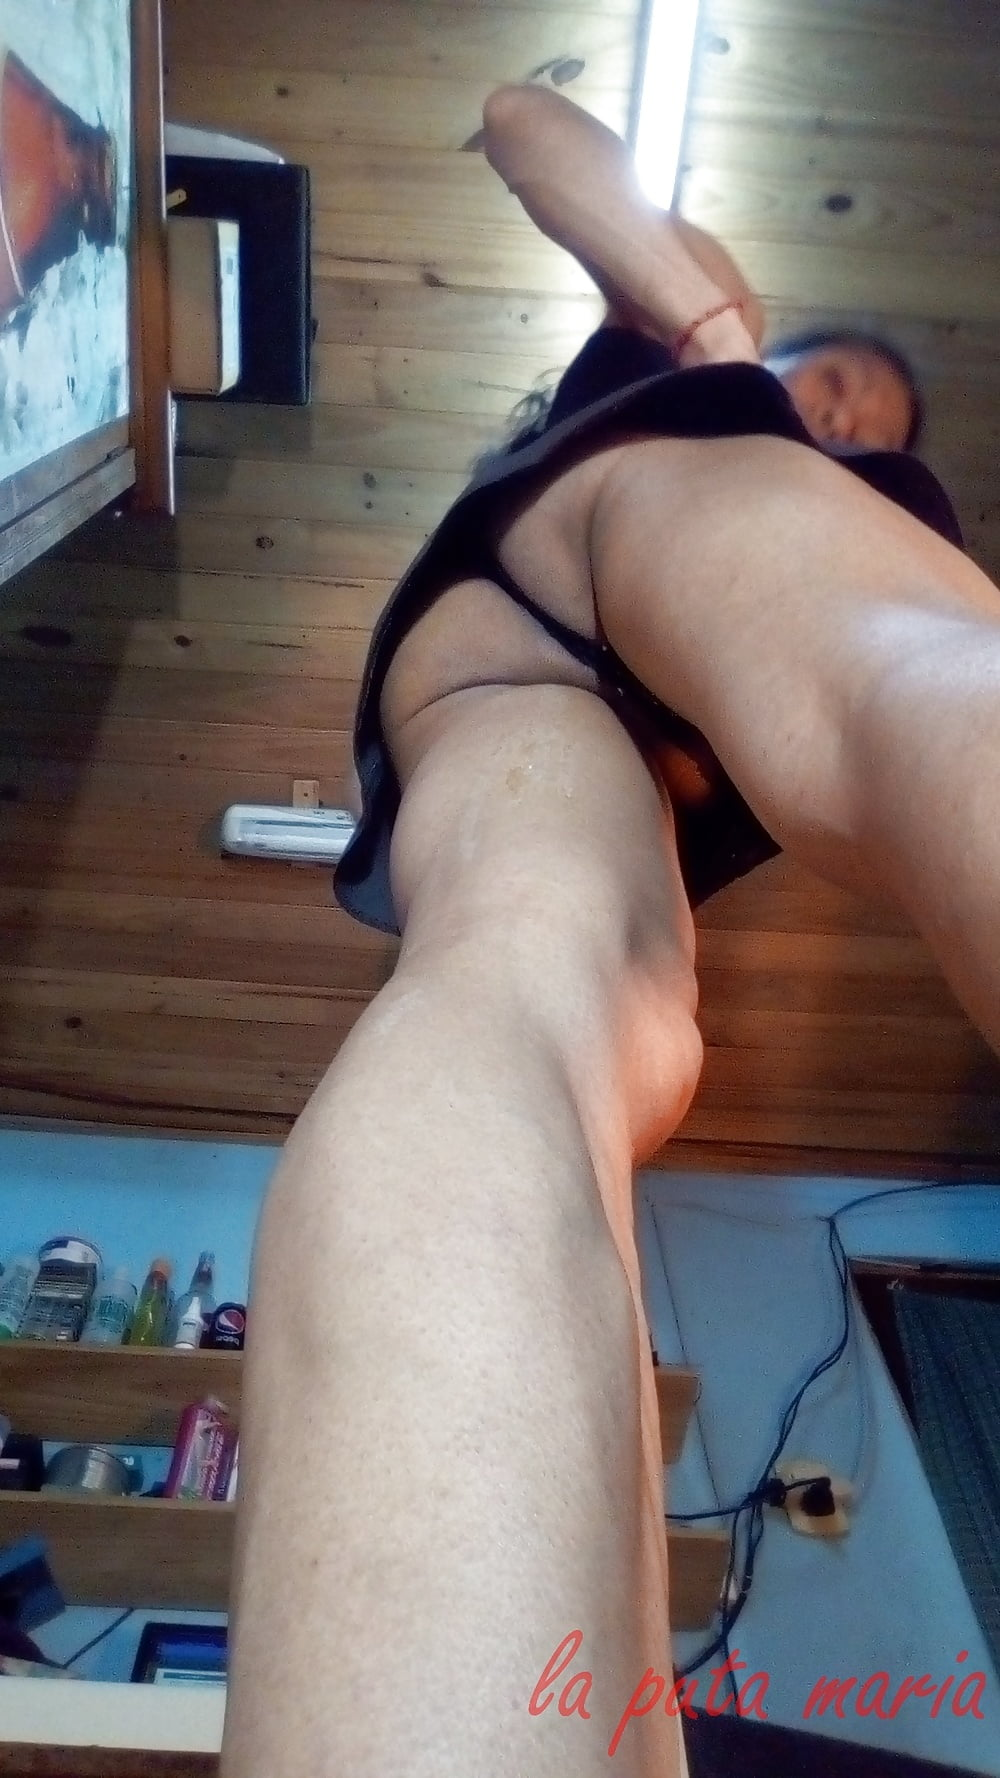 Cum dripping down legs